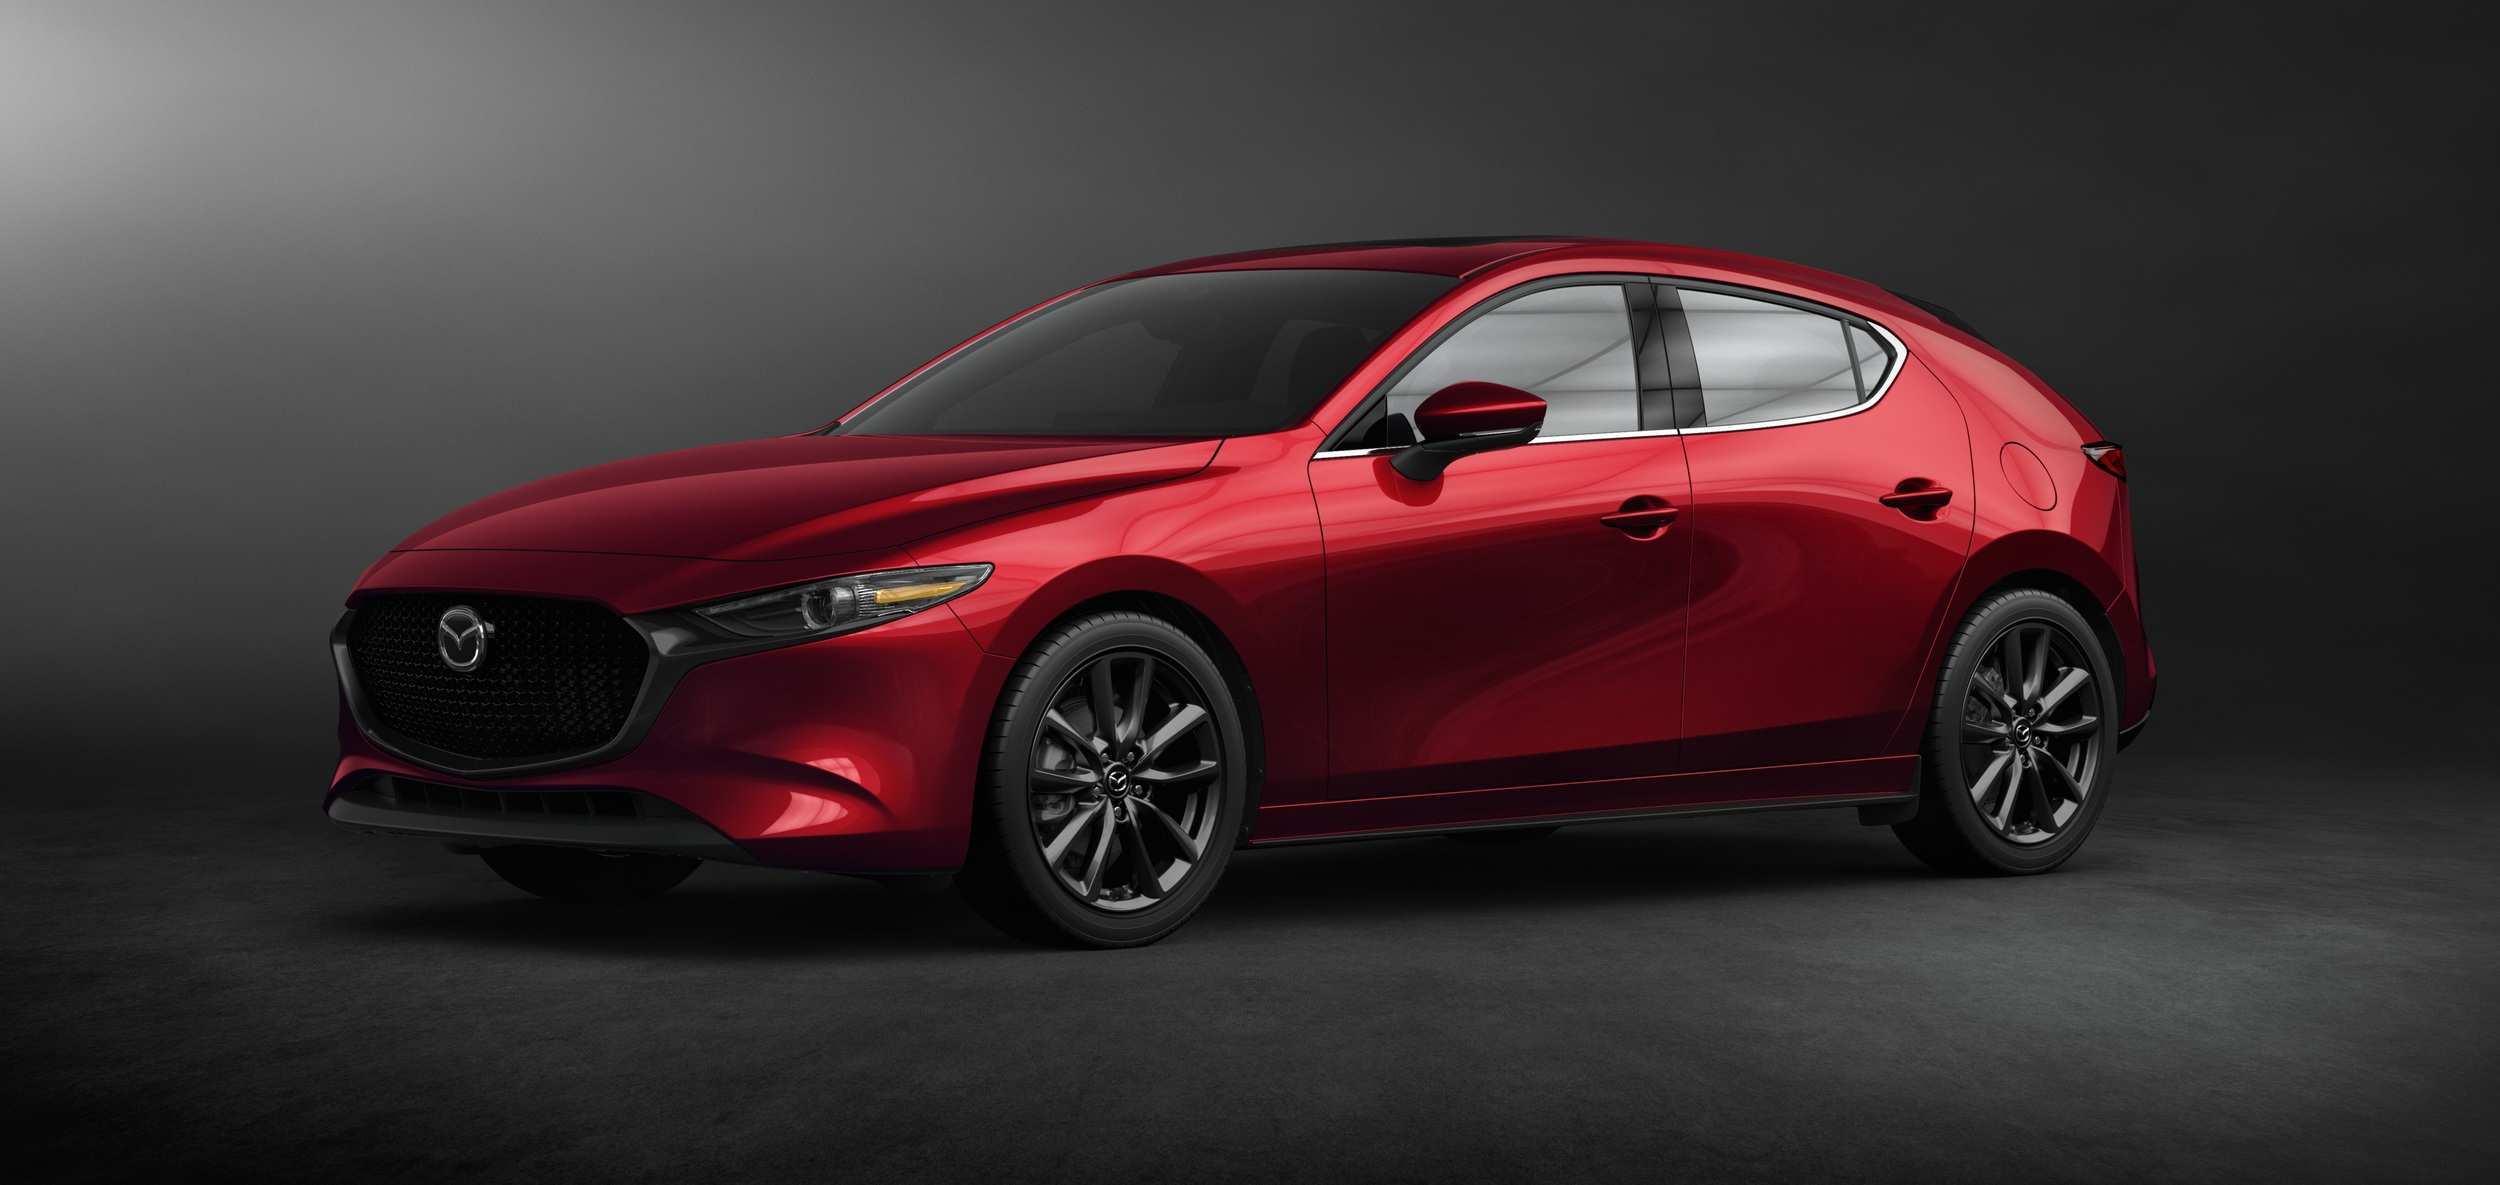 66 All New Mazda 3 2020 Cuando Llega A Mexico Exterior with Mazda 3 2020 Cuando Llega A Mexico